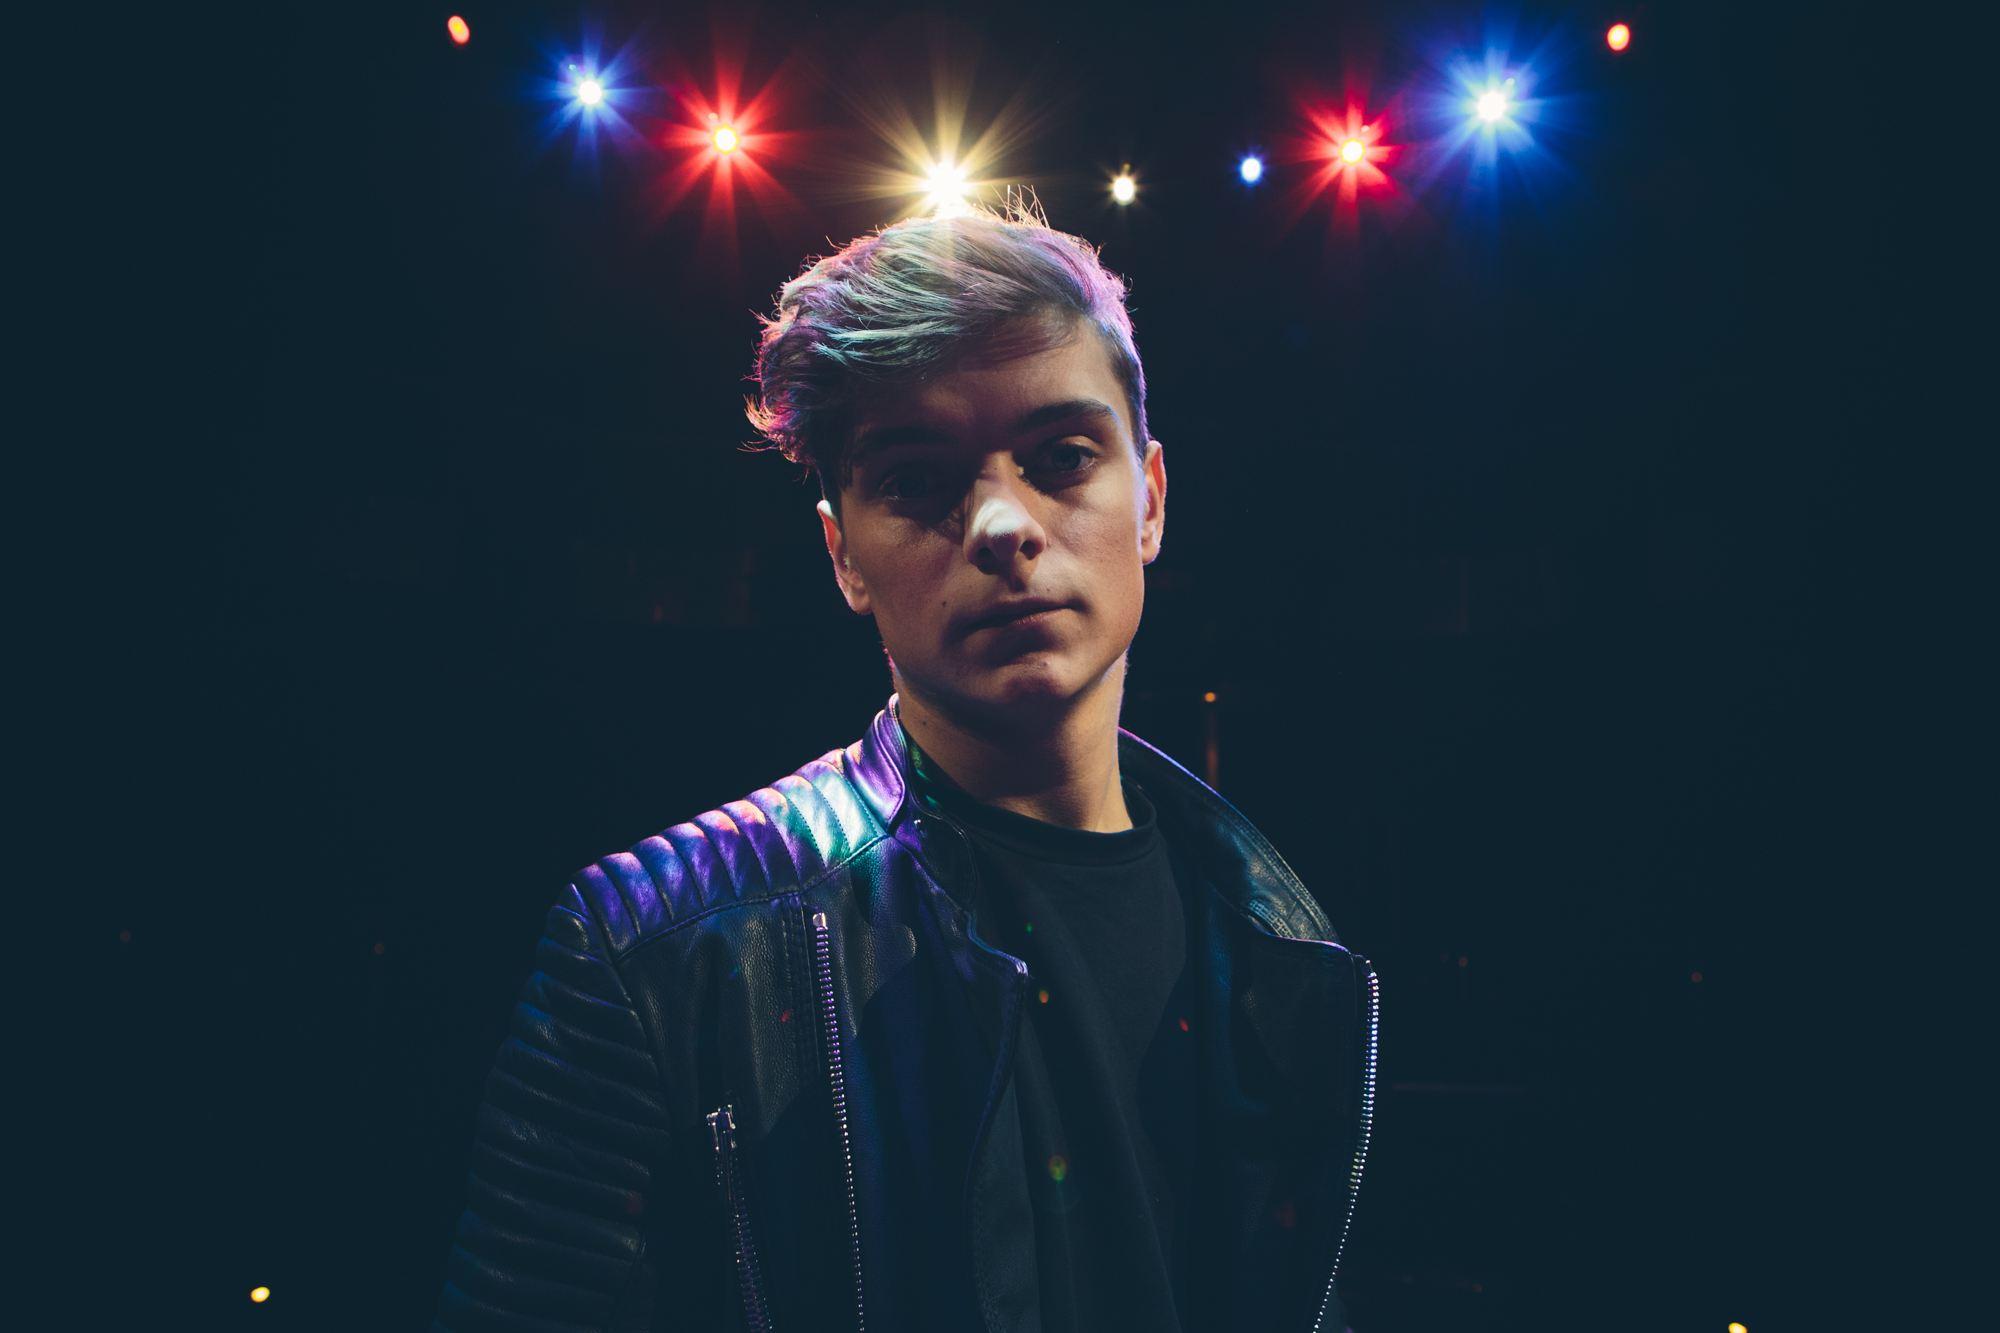 Martin Garrix Confirms Debut Album Plans Via Twitter Video